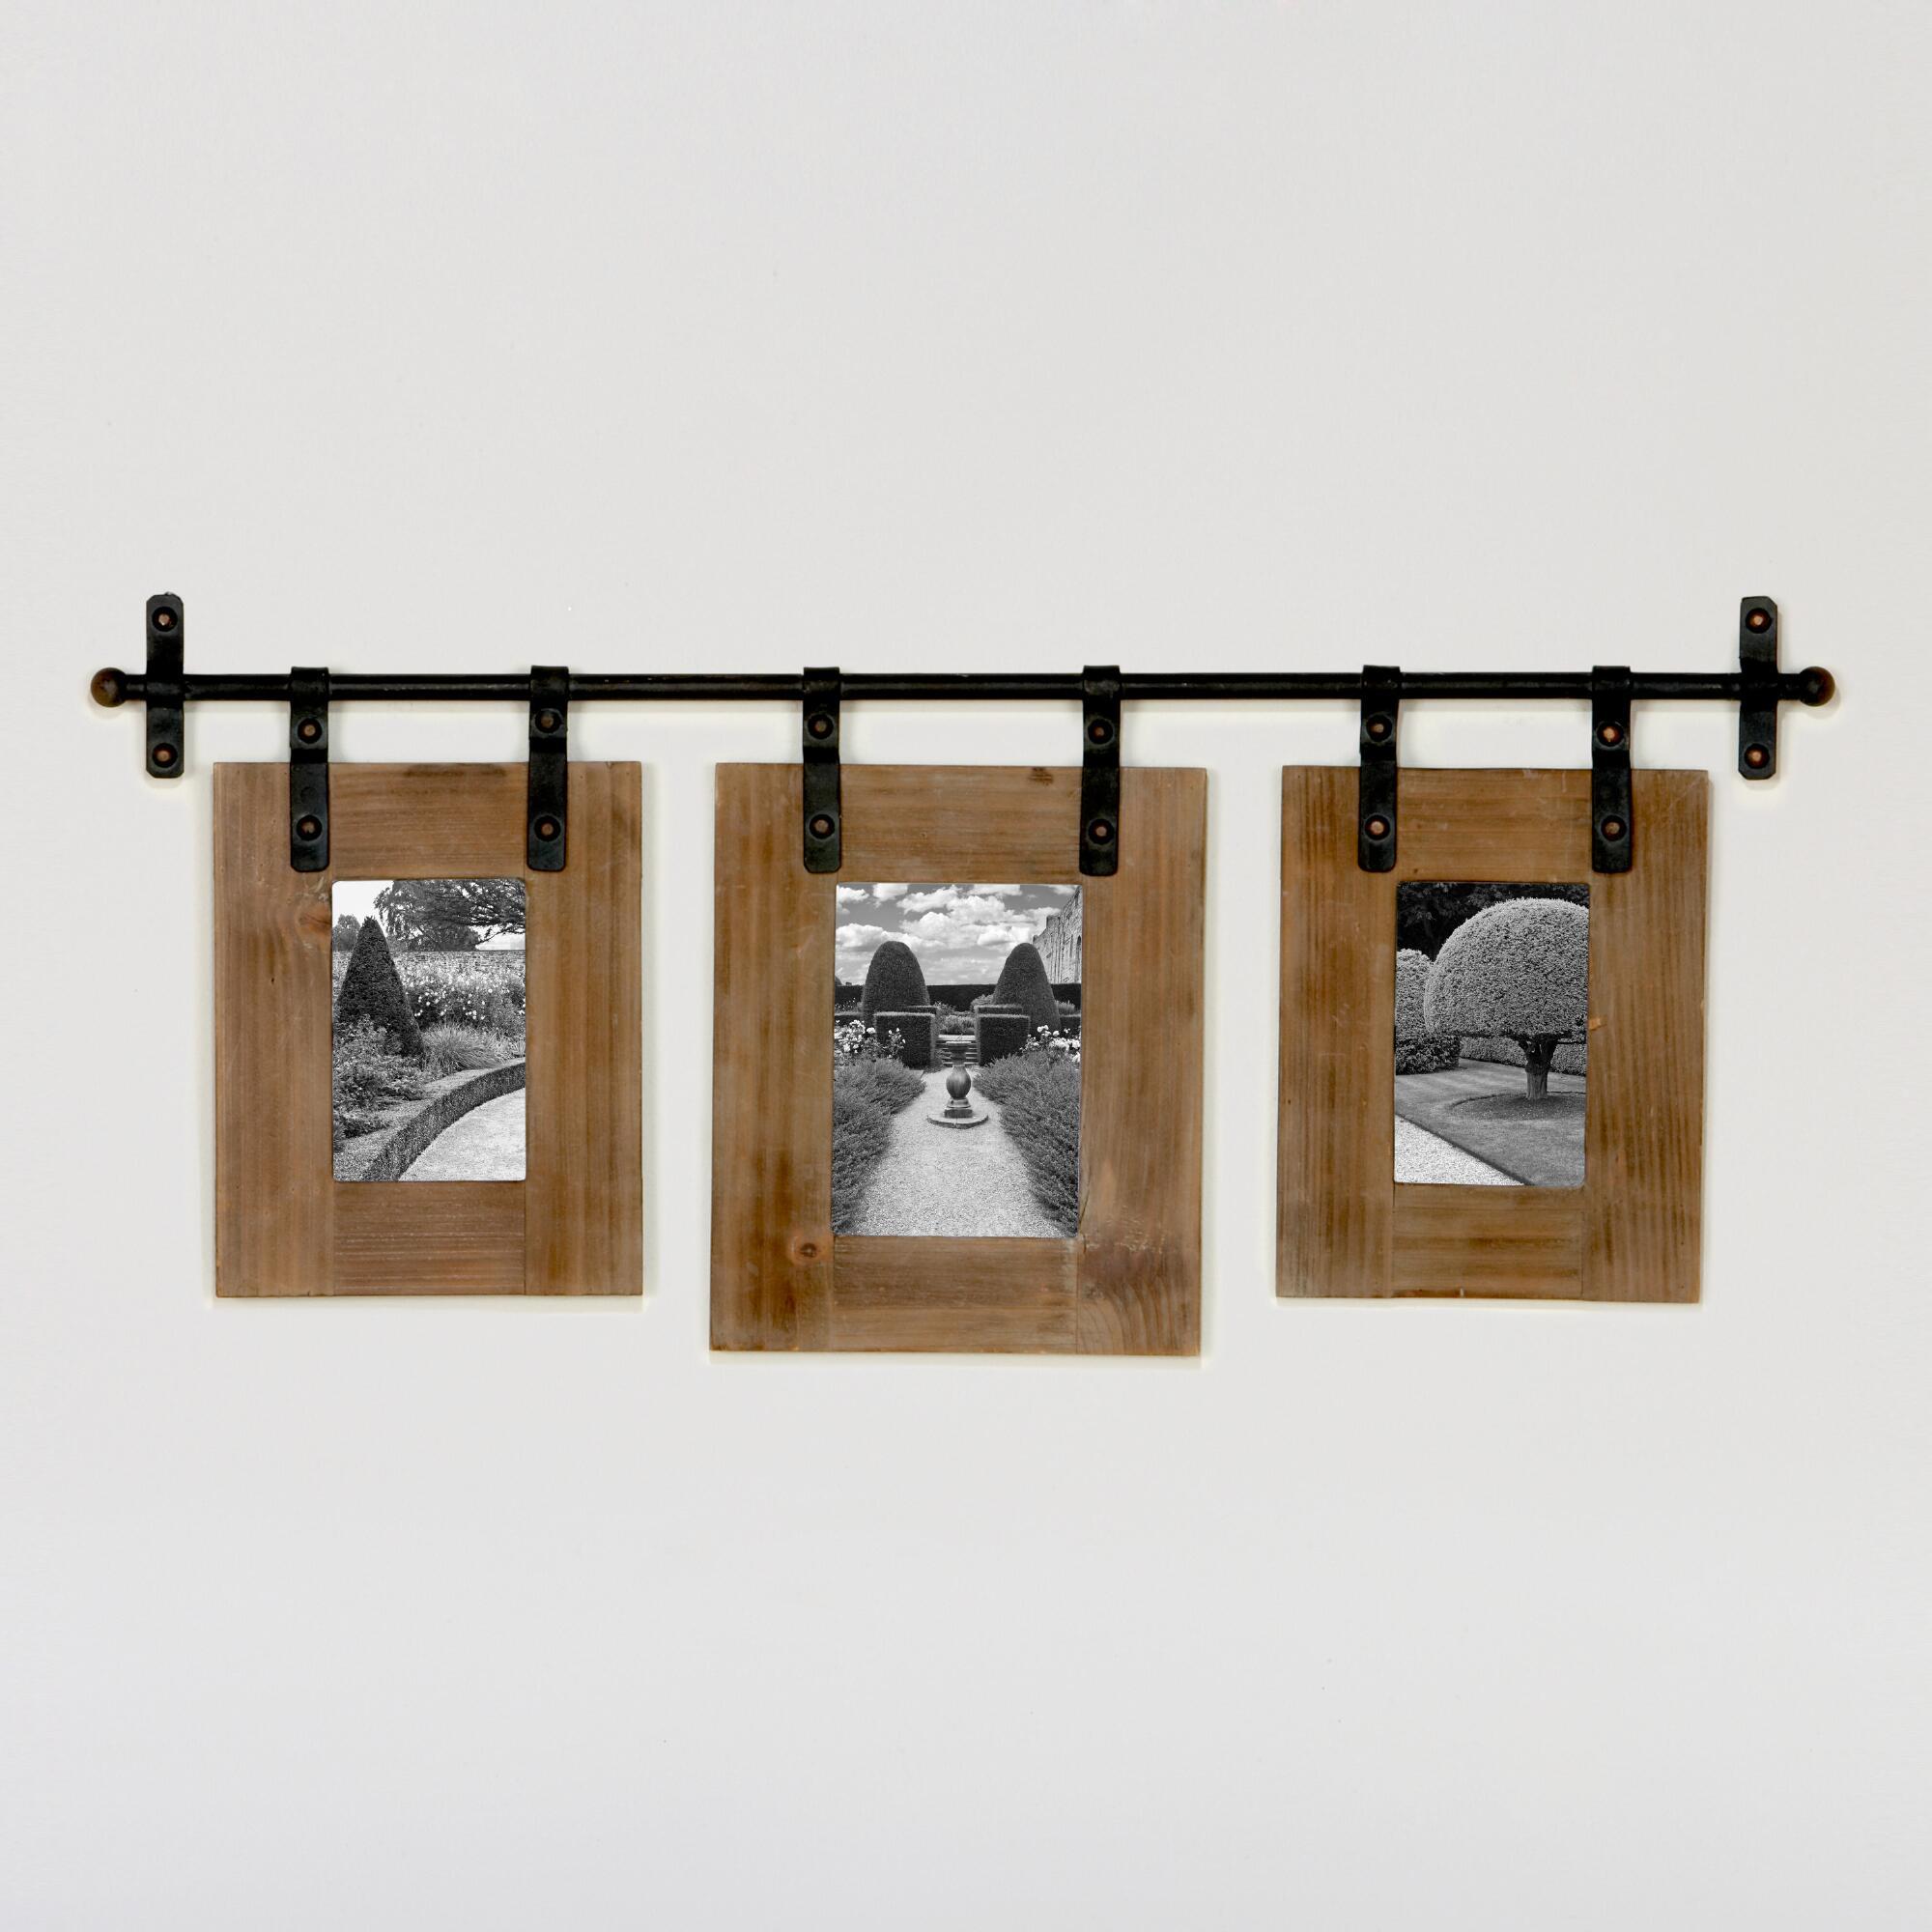 Jacob 3-Photo Wall Frame | World Market